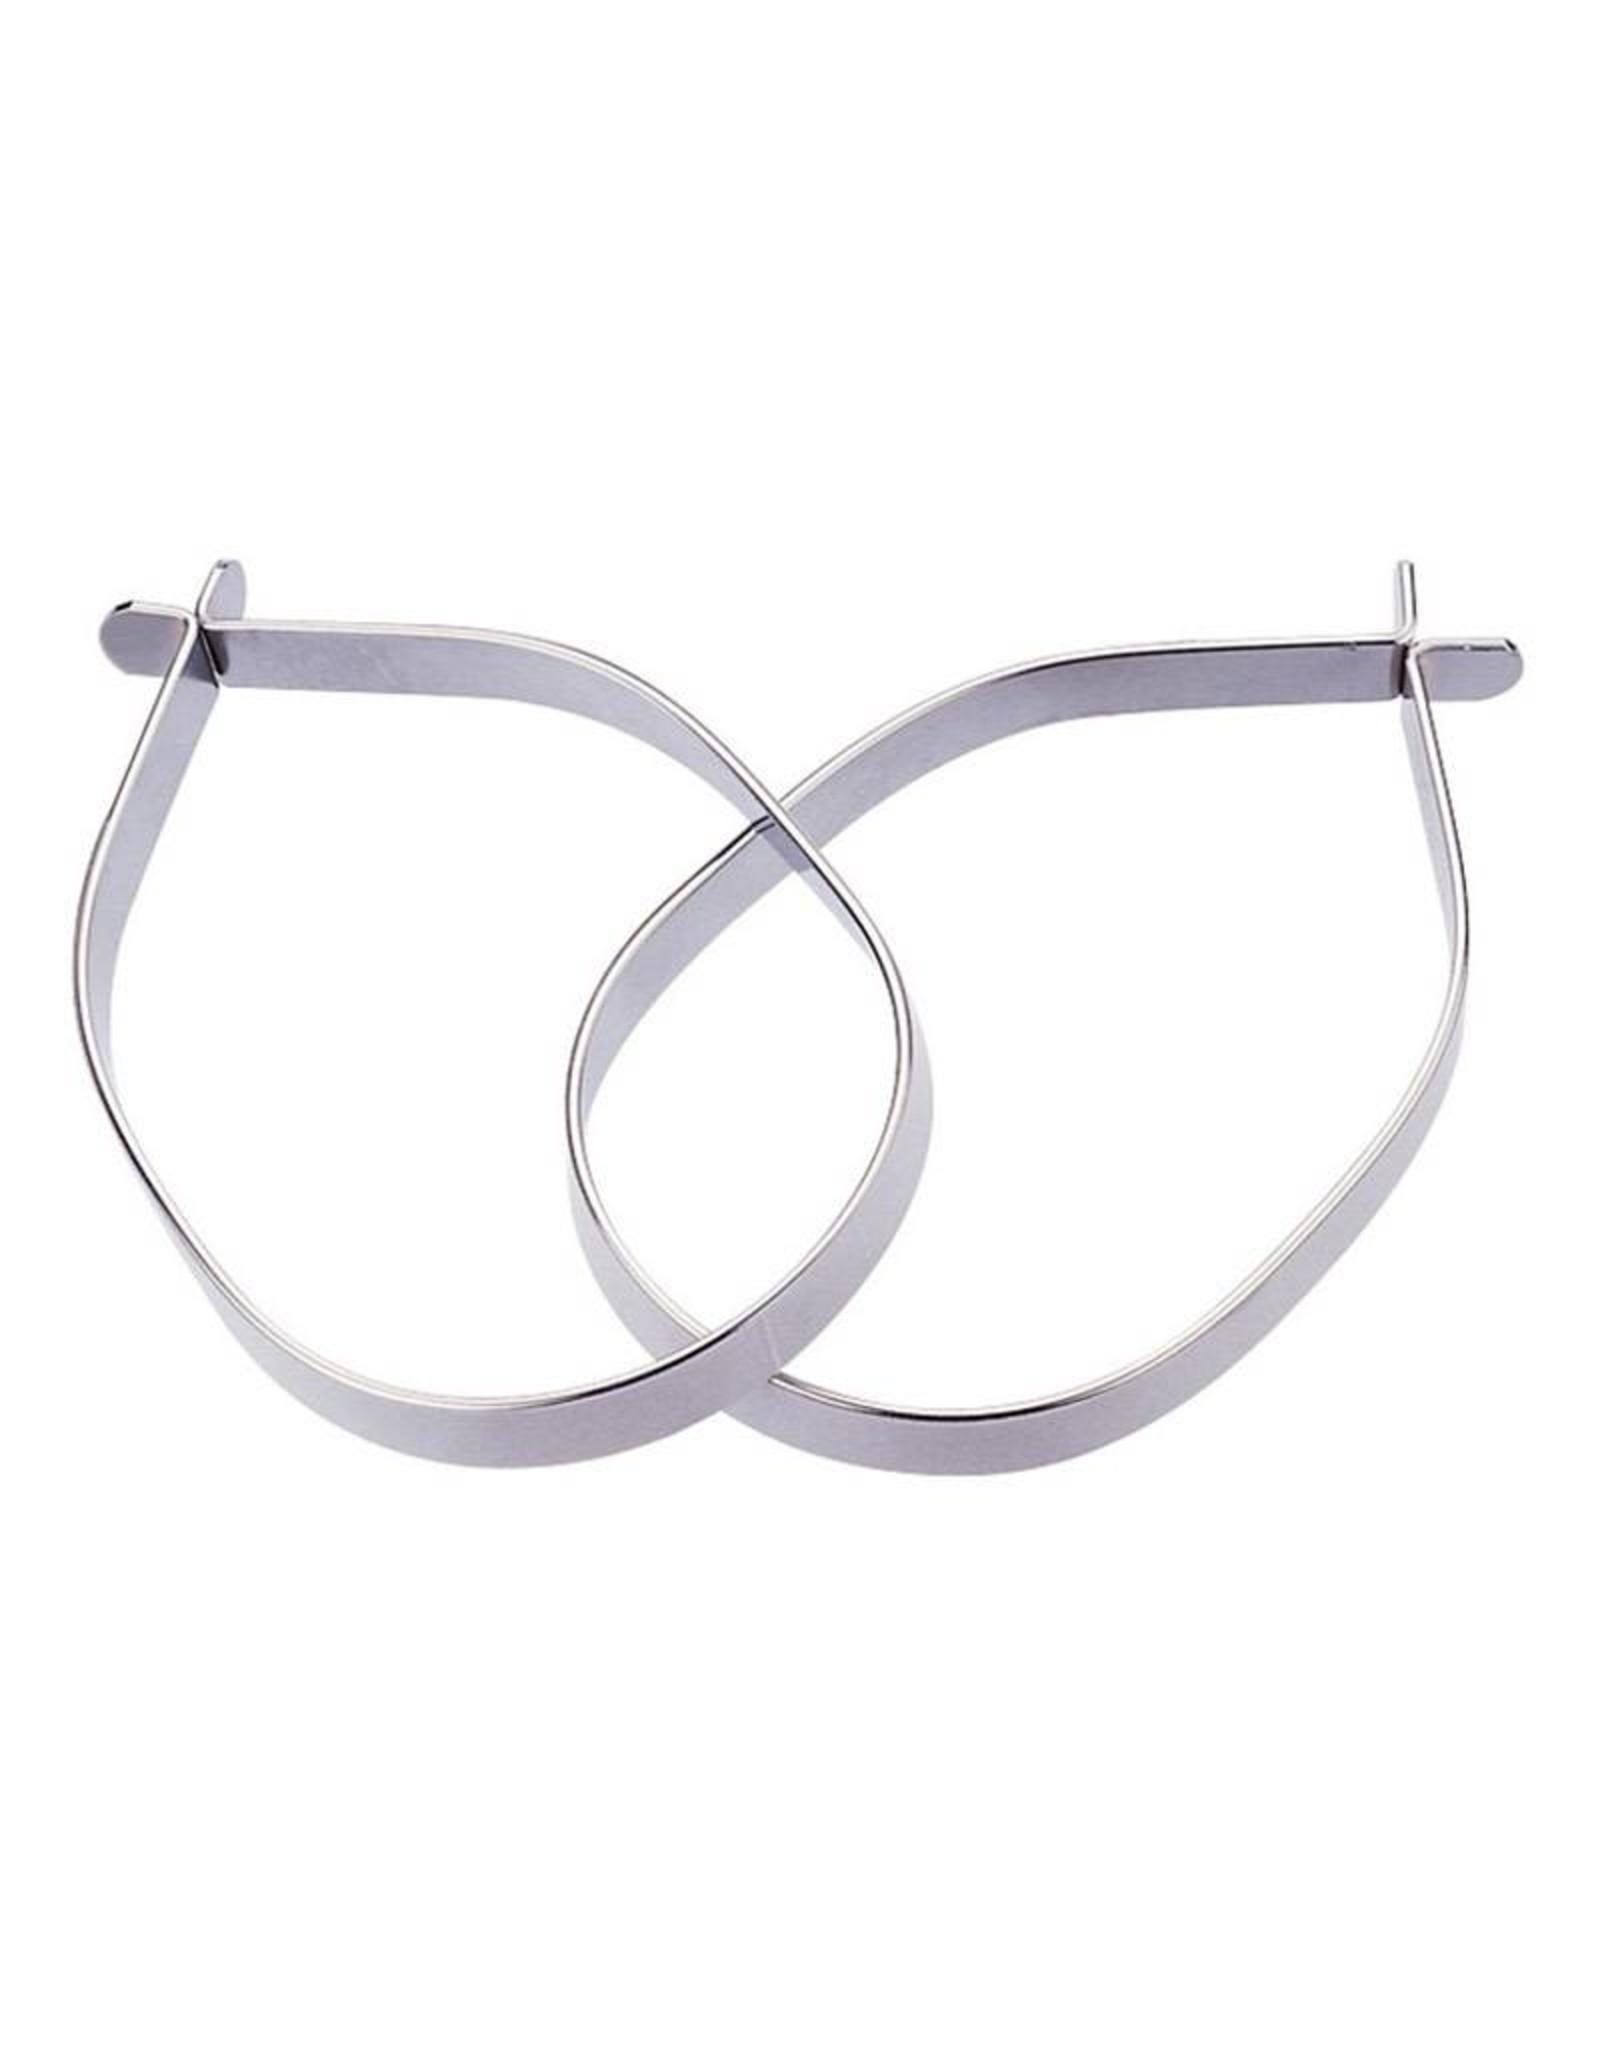 ICETOOLZ Steel Trouser Clip